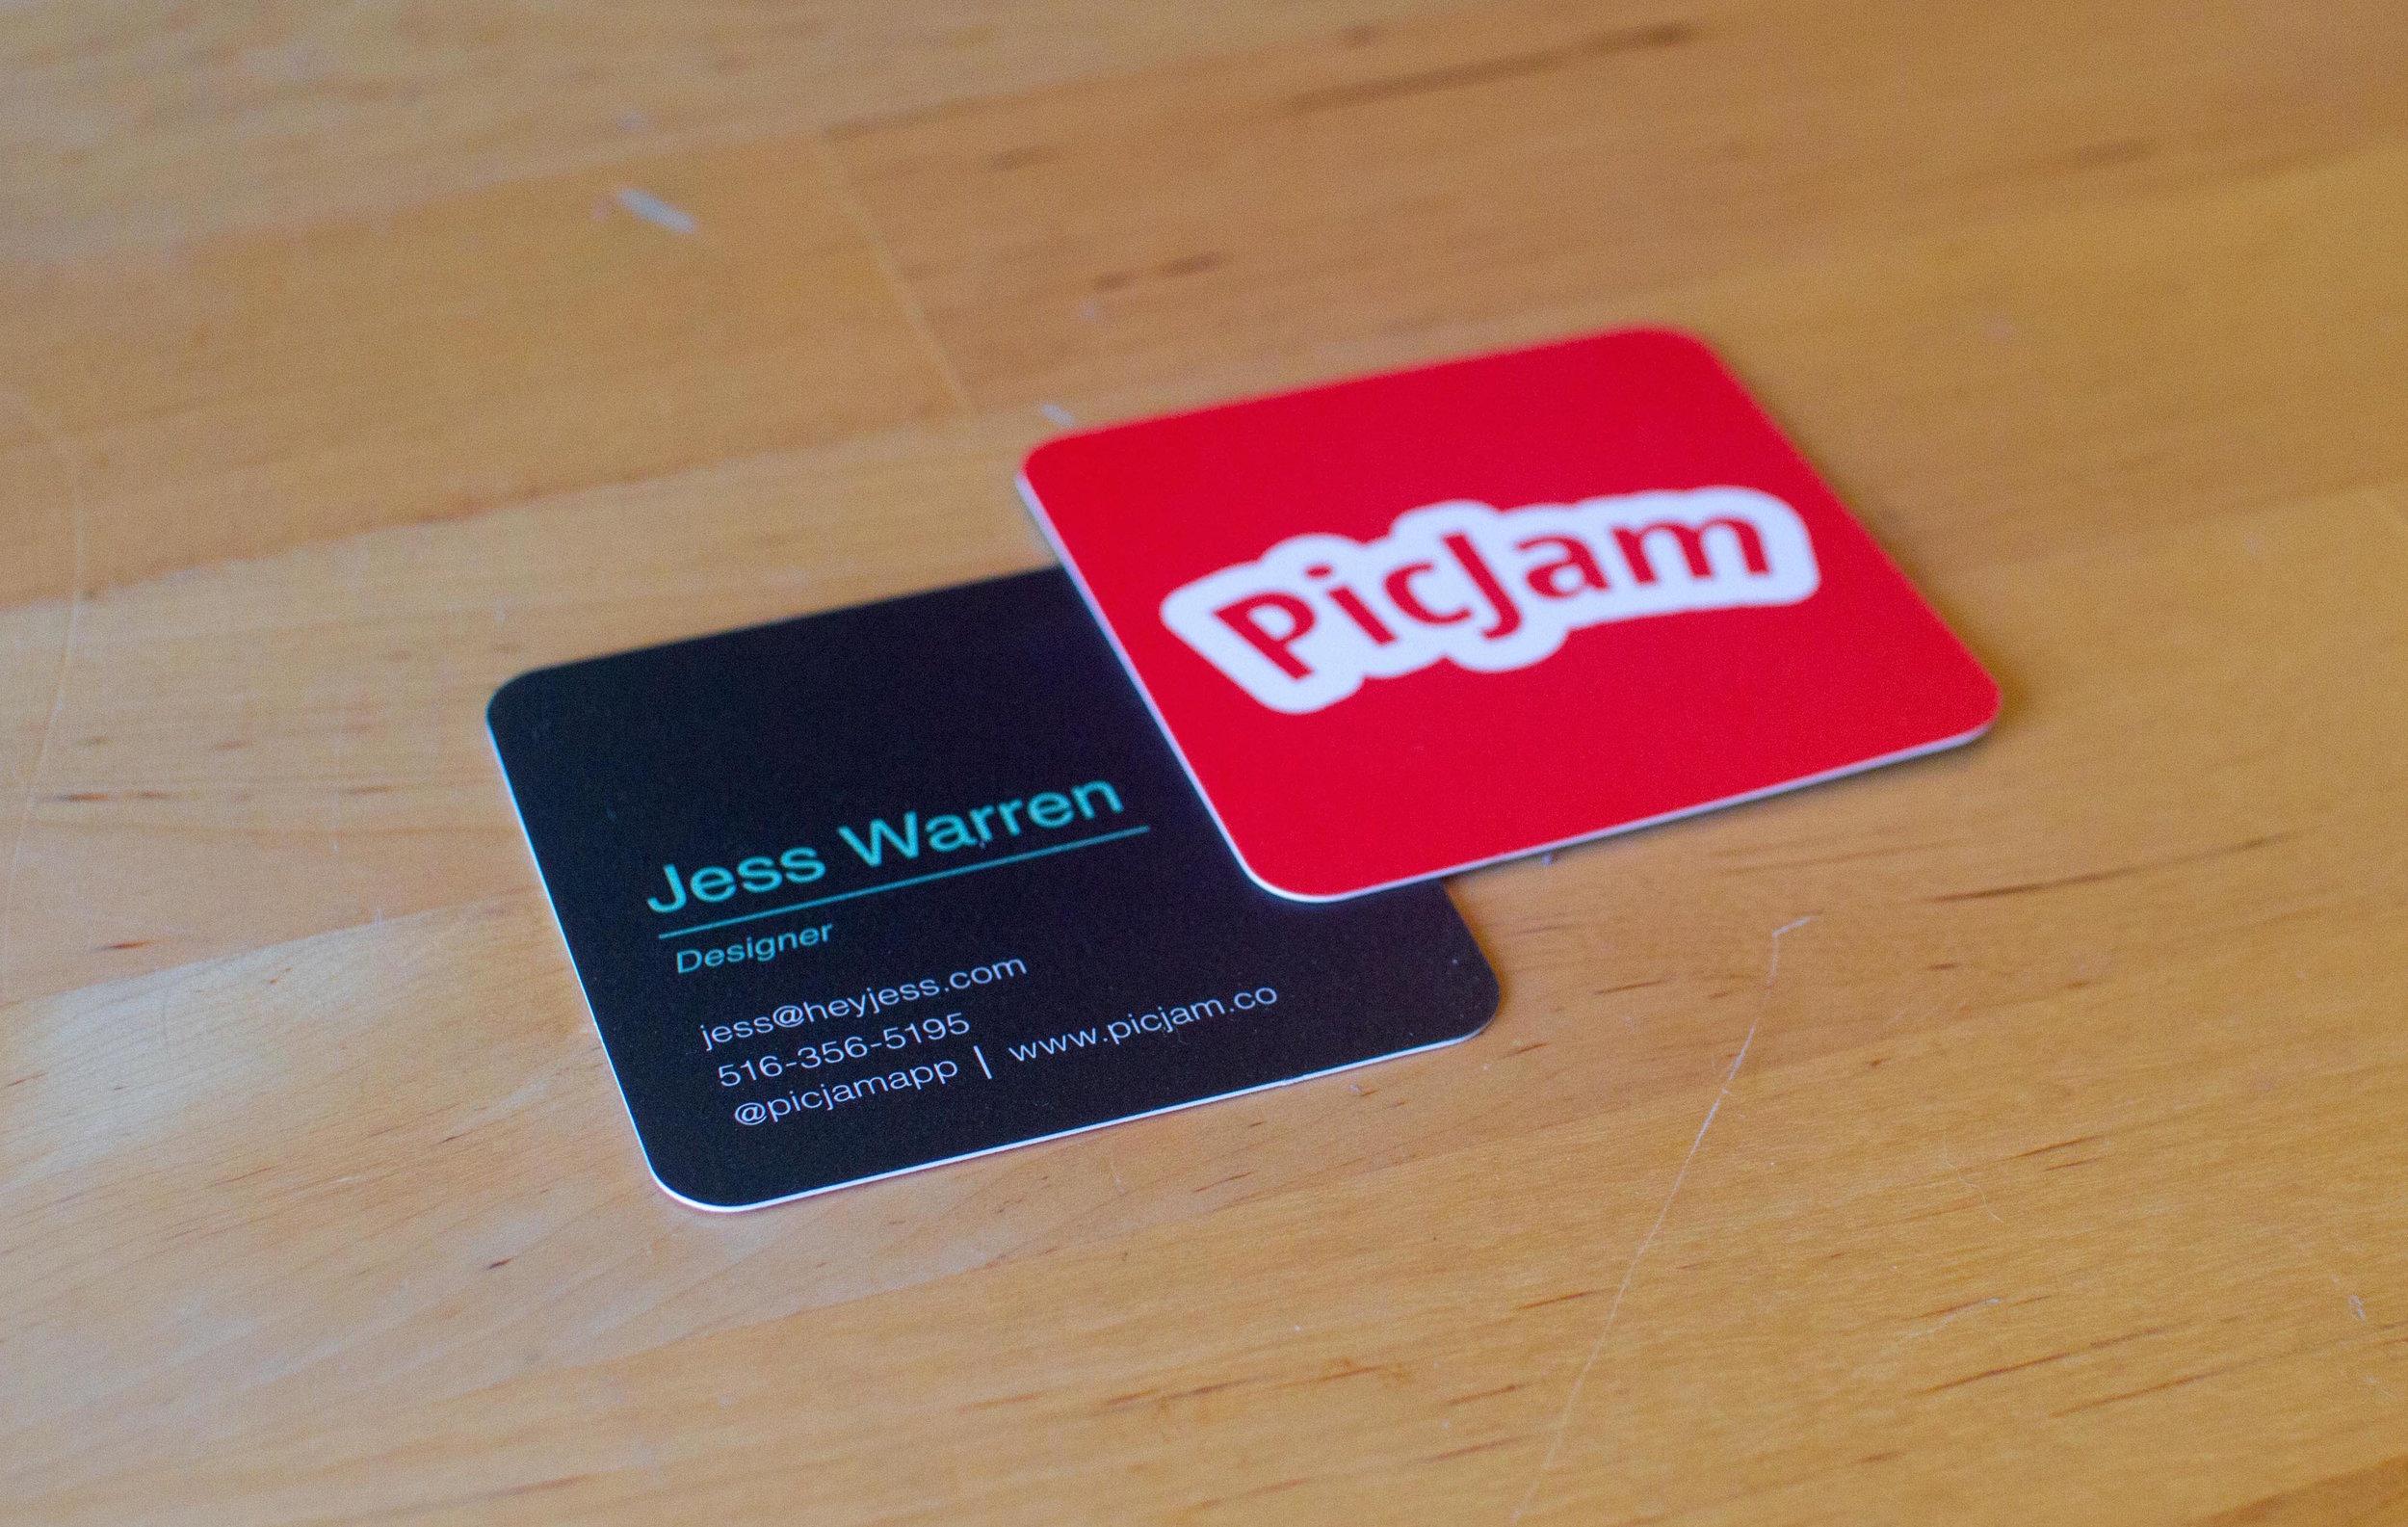 HeyJess_PicJam_businesscards